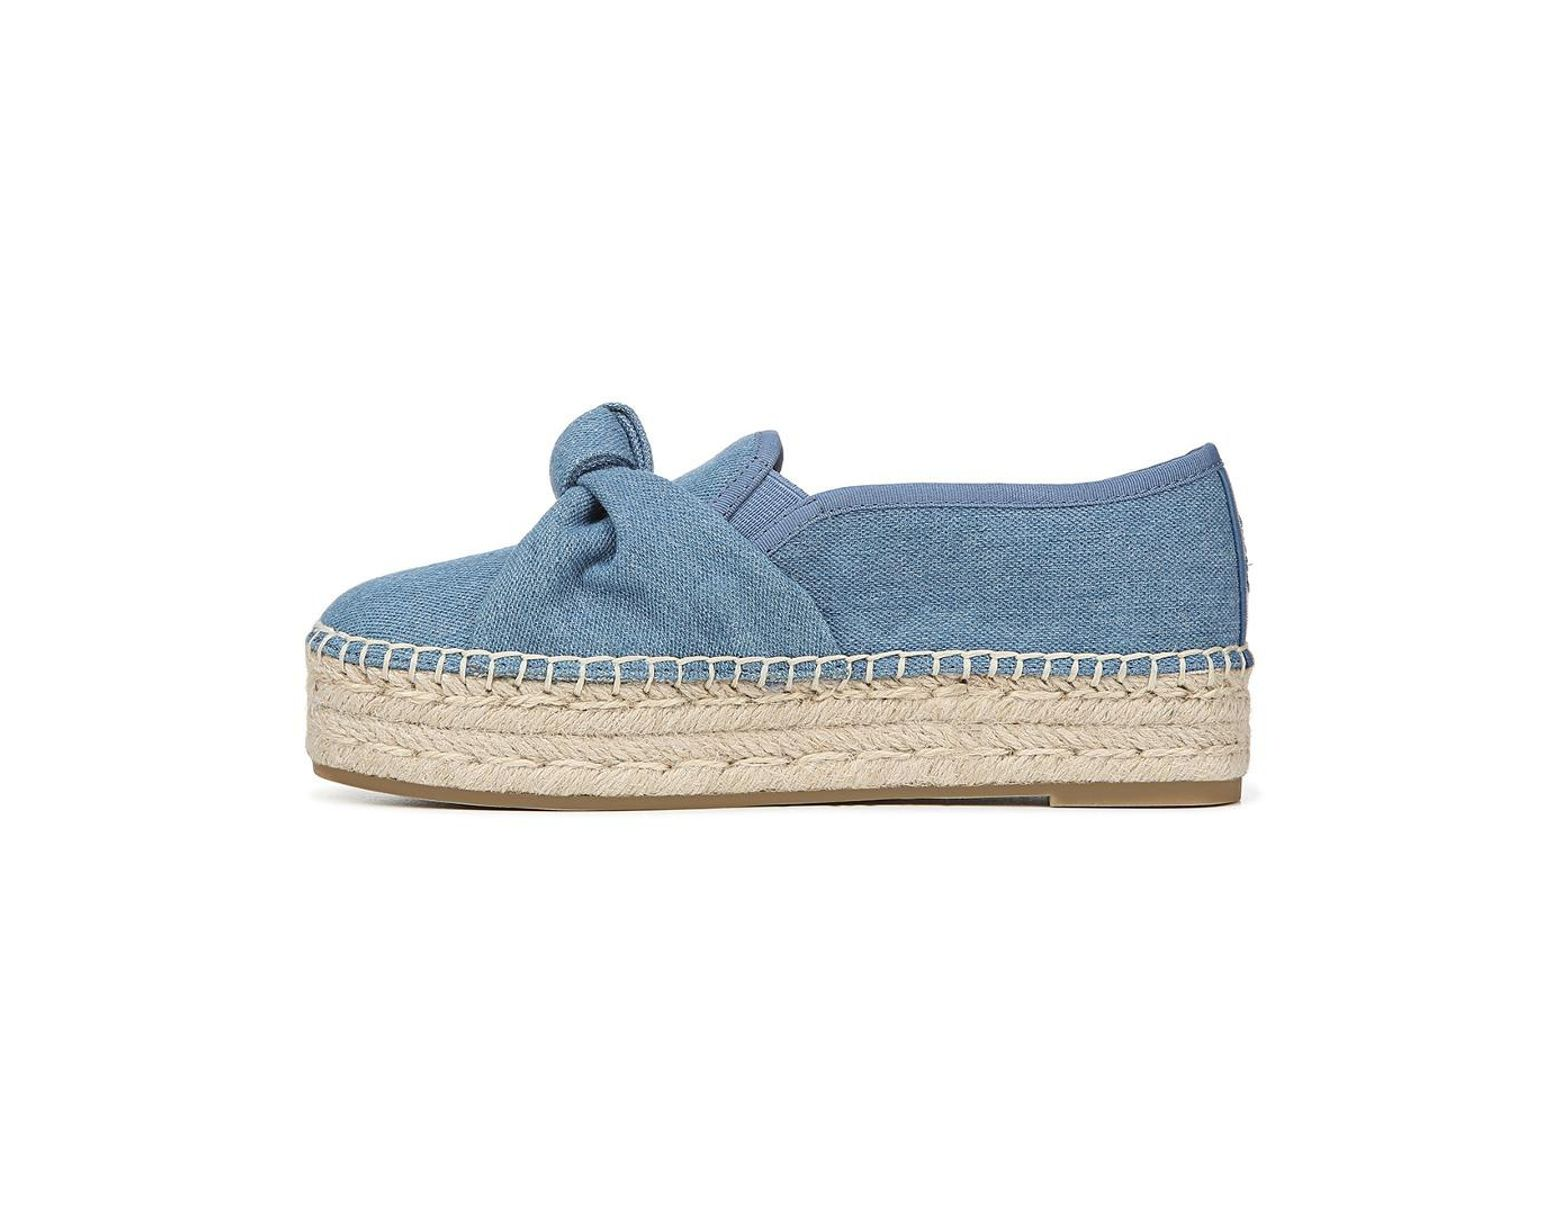 e54fcd9e6 Circus by Sam Edelman Columbia (mid Blue Metallic Metallic Denim) Shoes in  Blue - Save 51% - Lyst